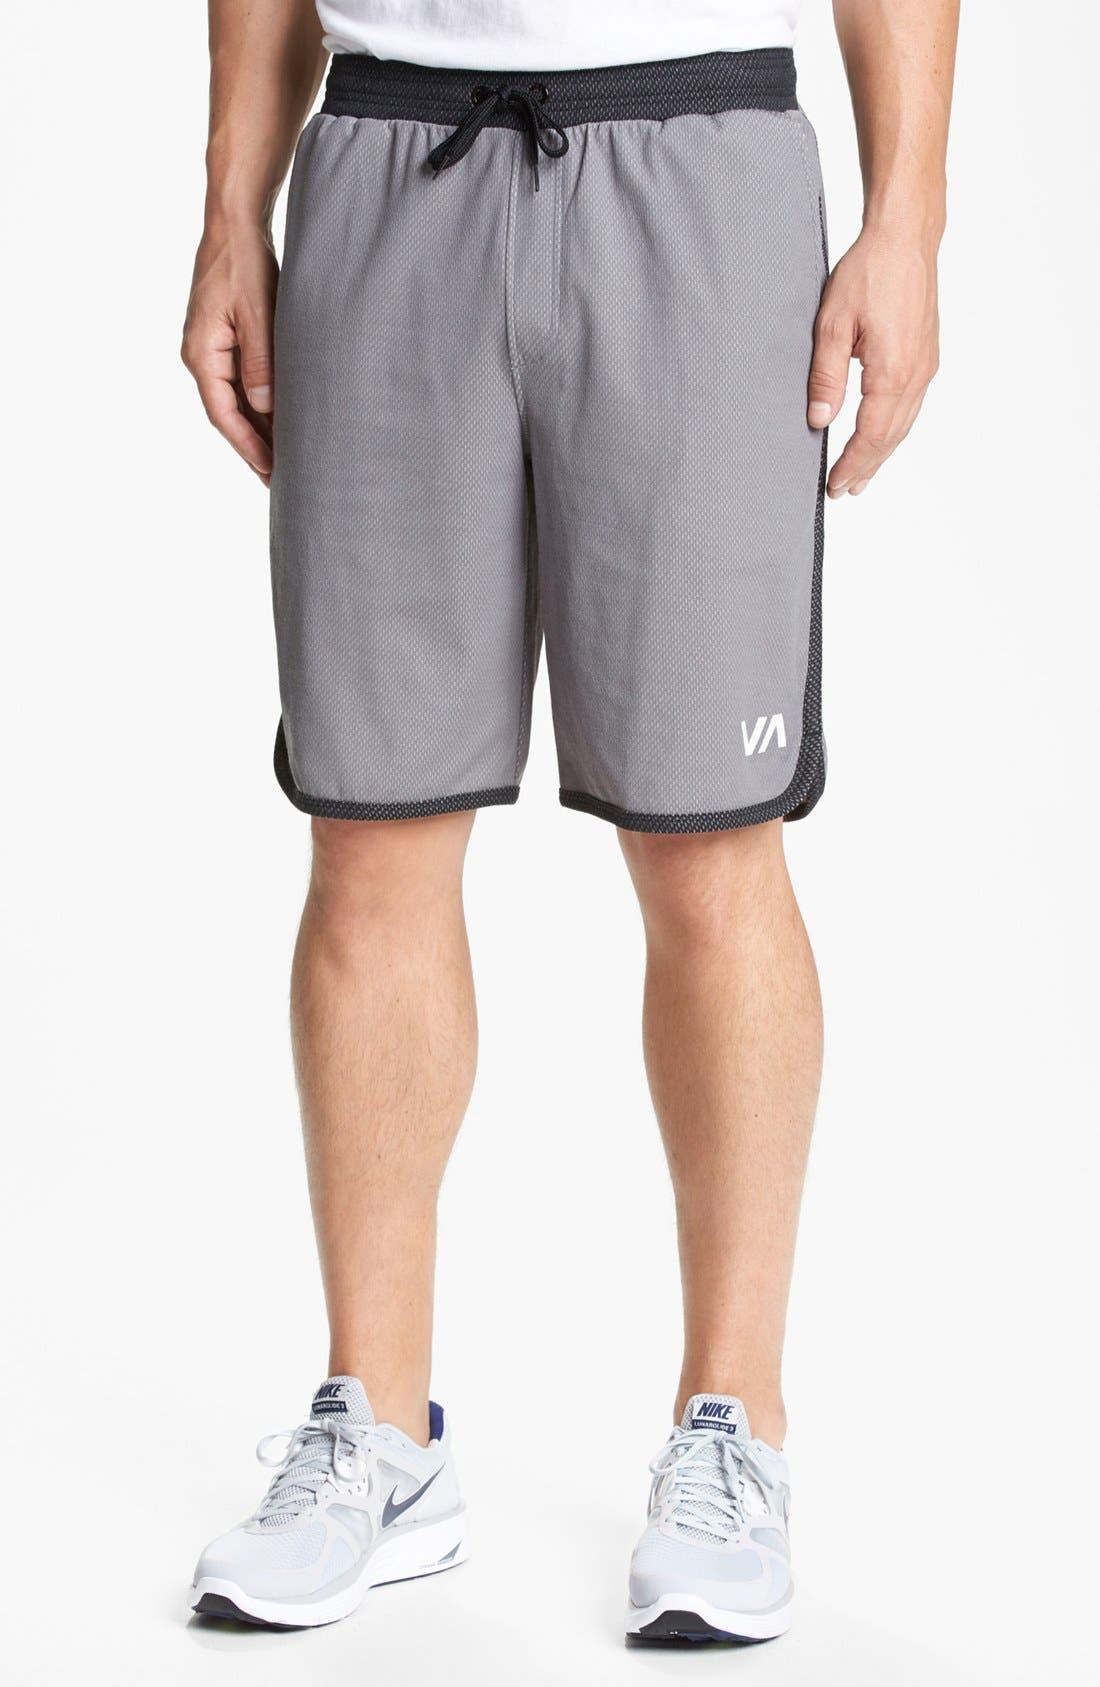 Alternate Image 1 Selected - RVCA 'VA Sport' Shorts